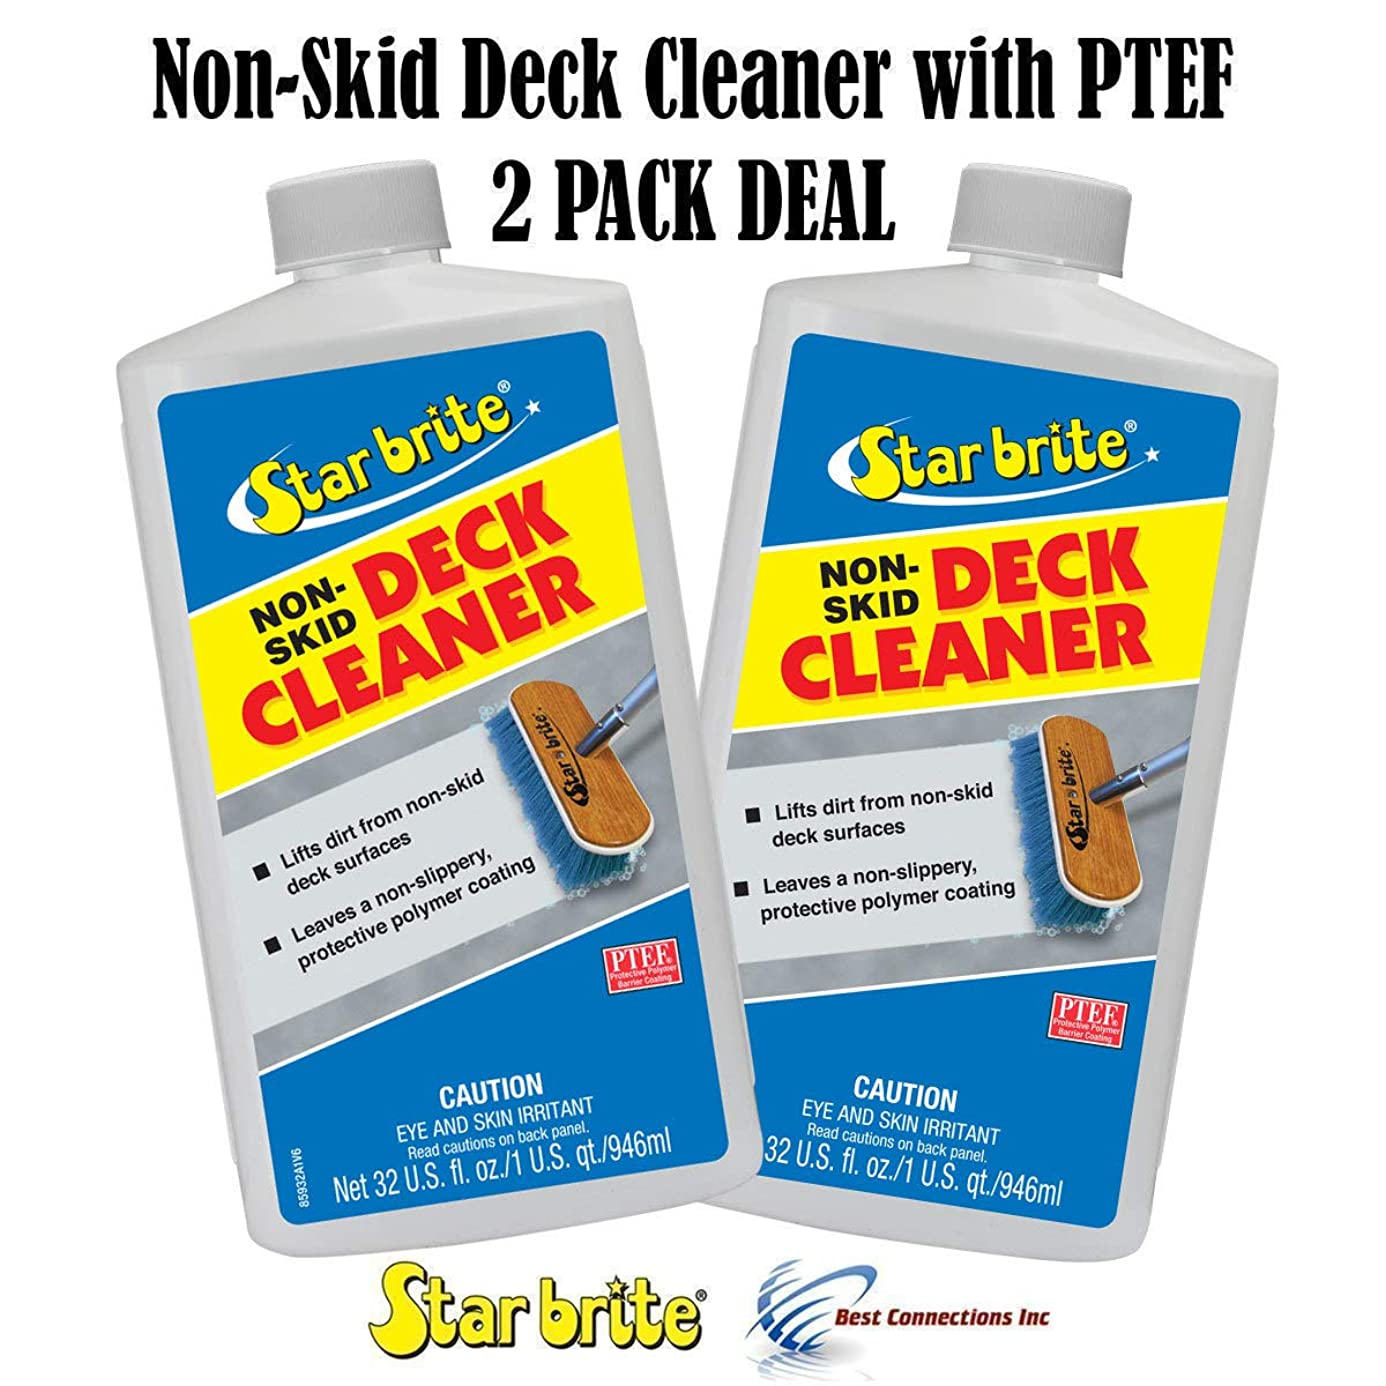 Starbrite 85932 Non-Skid Deck Cleaner W/ PTEF 32 oz (2 PACK DEAL)